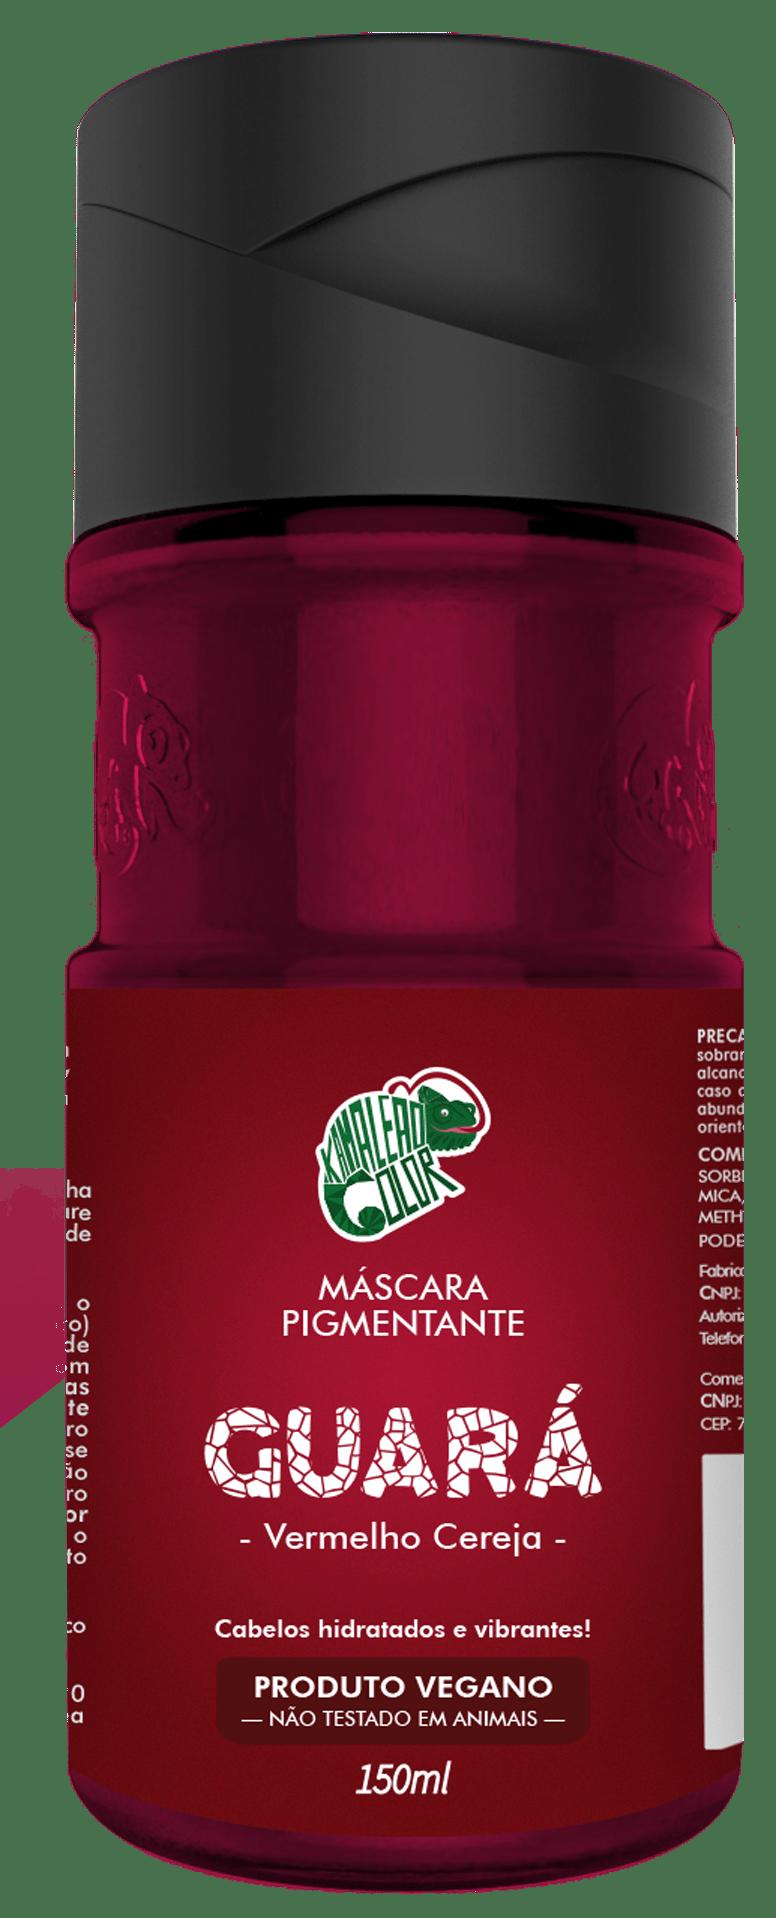 Máscara Pigmentante Guará Kamaleão Color Cereja